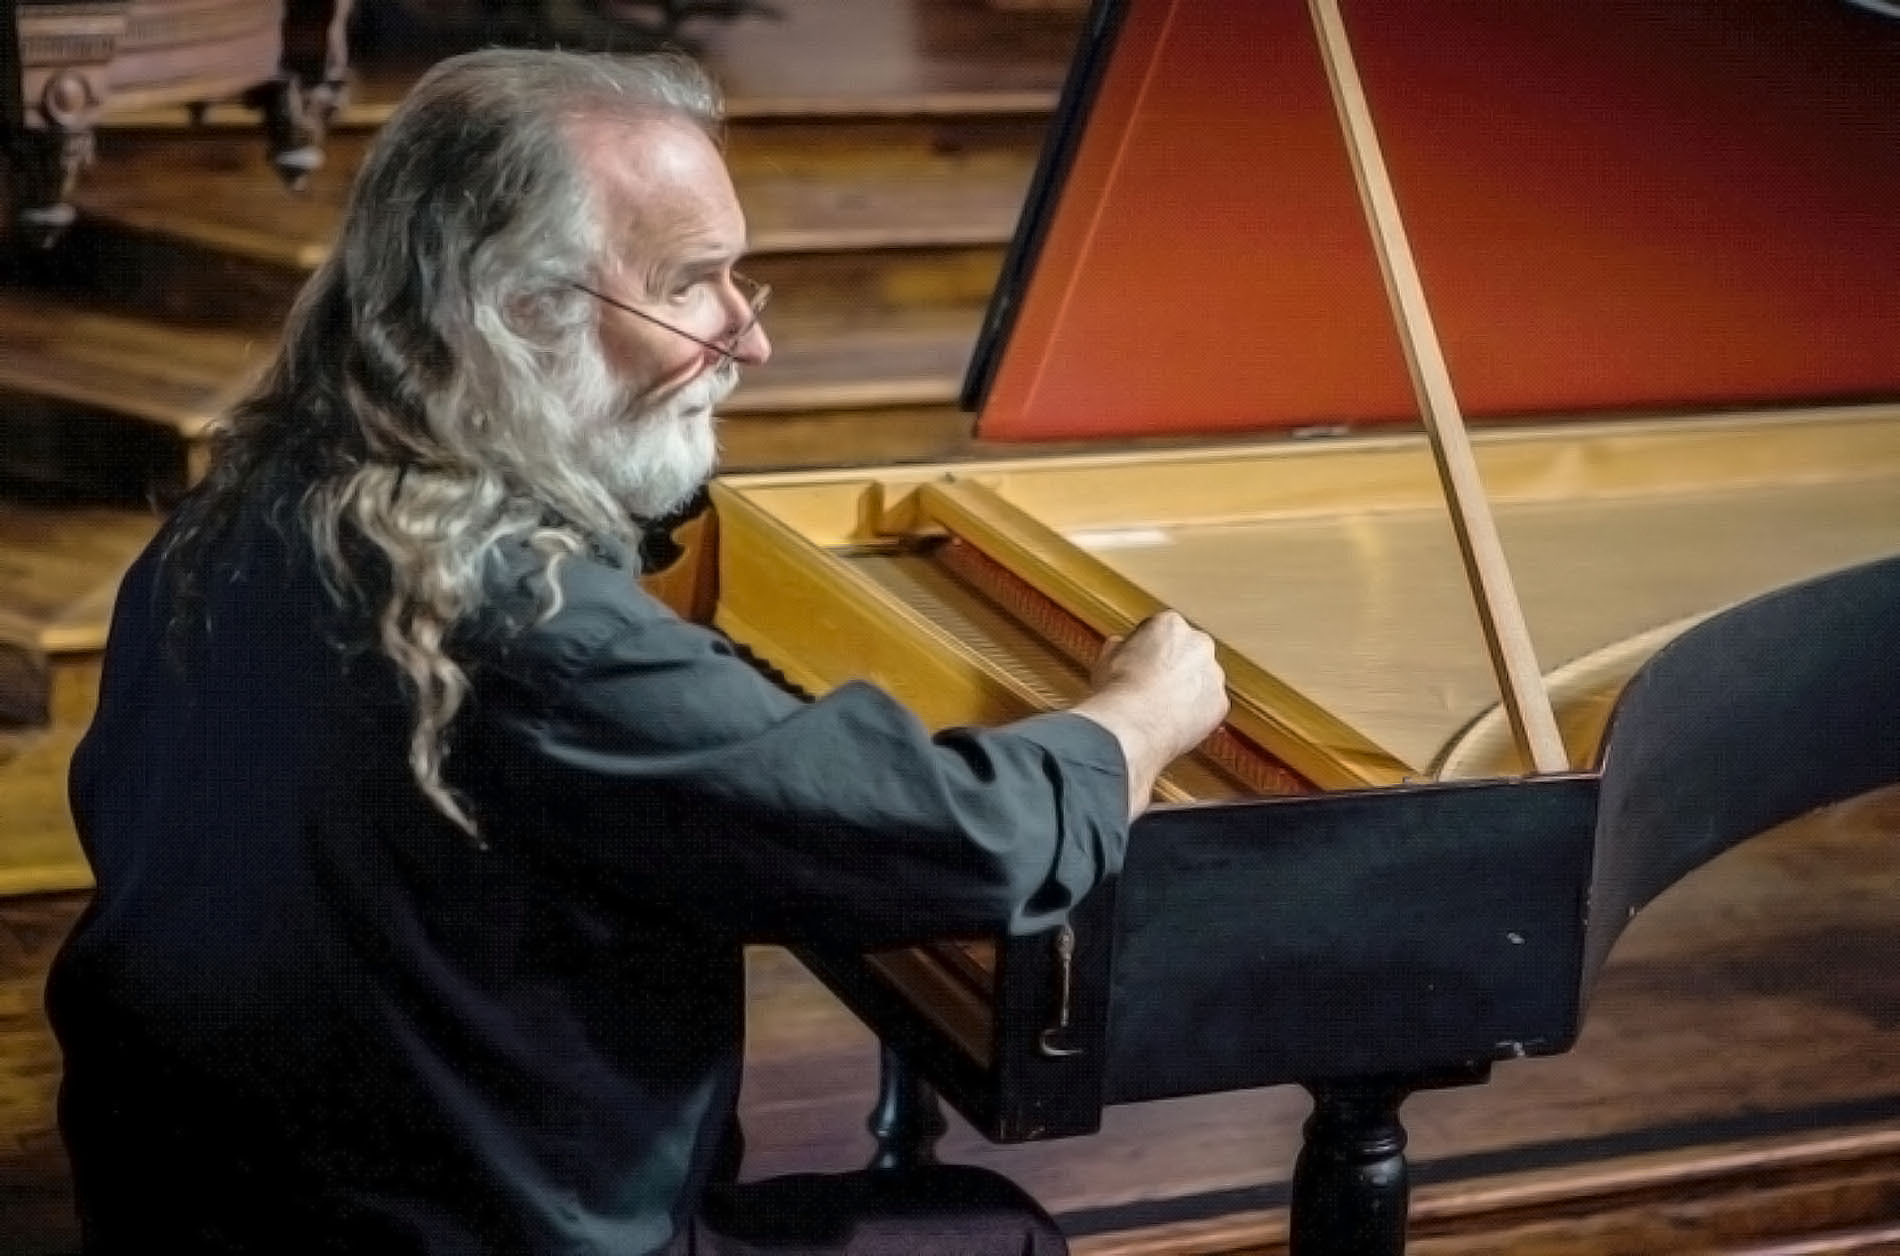 salzedo playing harpsichord